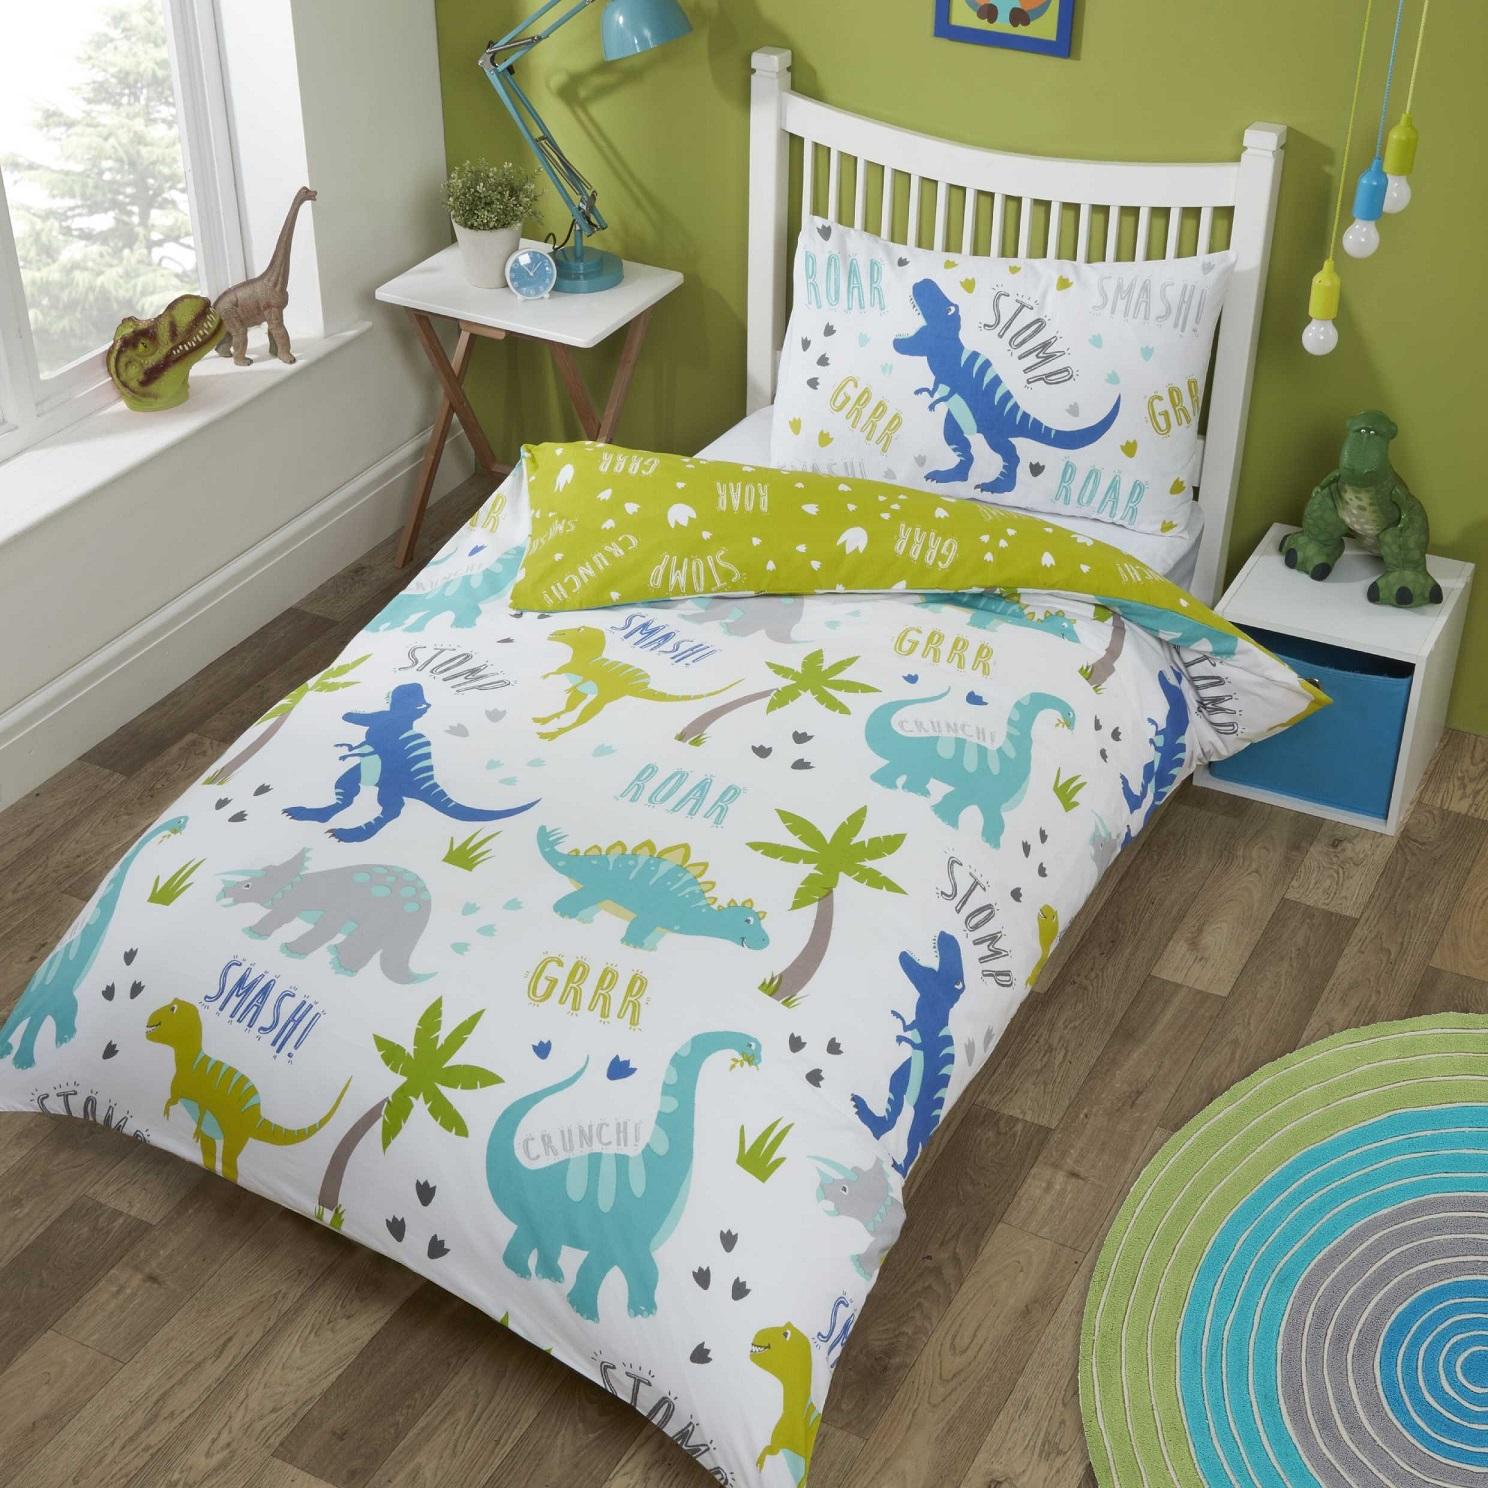 details about dinosaurs toddler cot bed duvet cover t rex kid boy quilt bedding set green blue